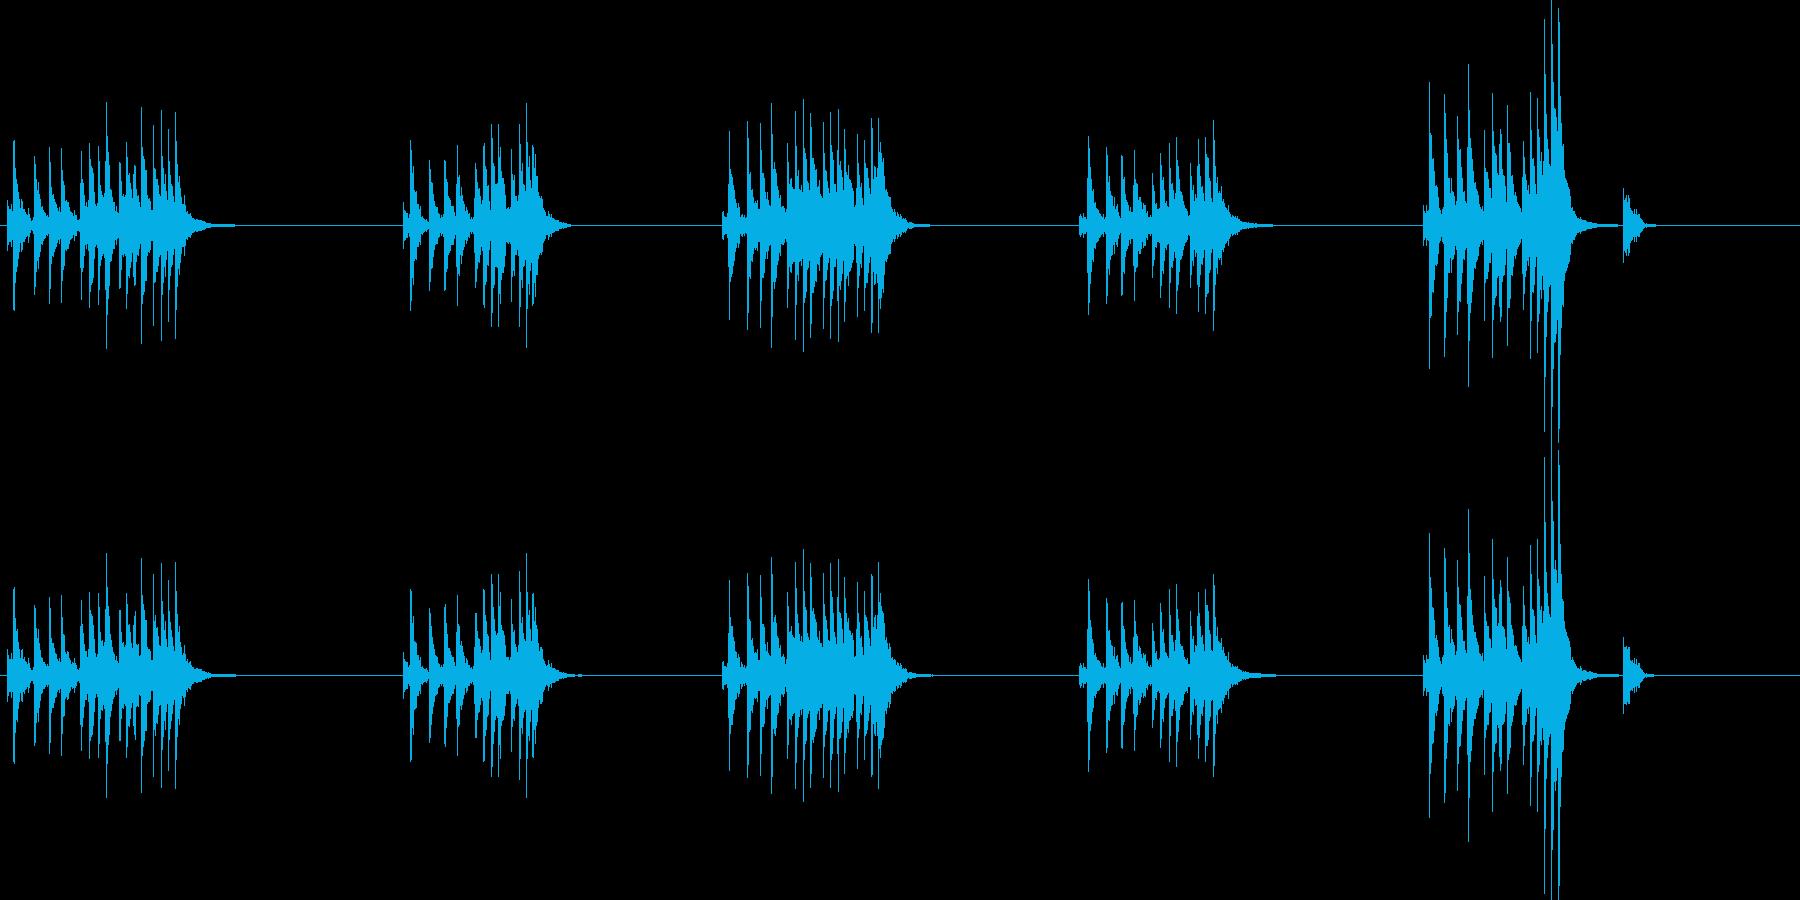 大太鼓8風音歌舞伎情景描写和風和太鼓ホラの再生済みの波形